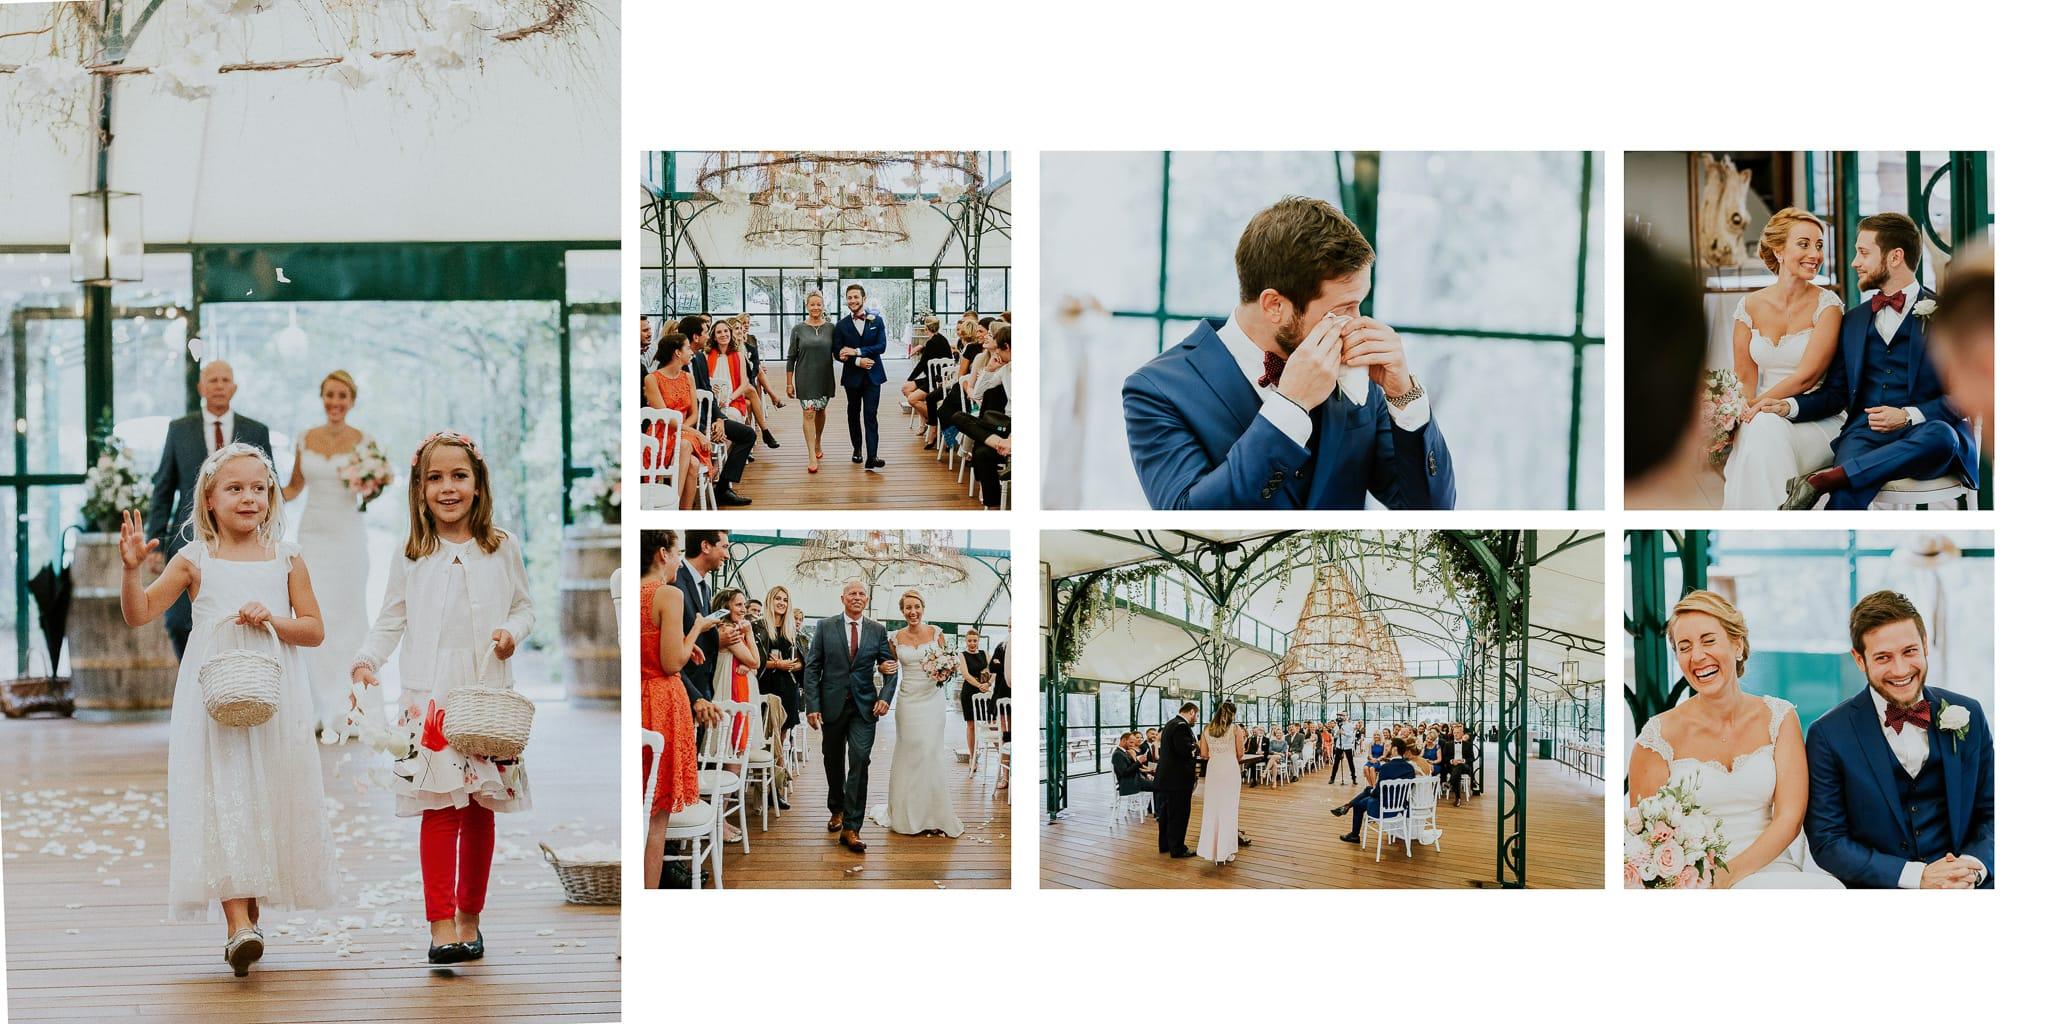 Costi-Moiceanu-Photographer-CM-Photography-Wedding-Mariage-French-Riviera-Cote-D-Azur-Alpes-Maritimes-Weding-Album-Design-9